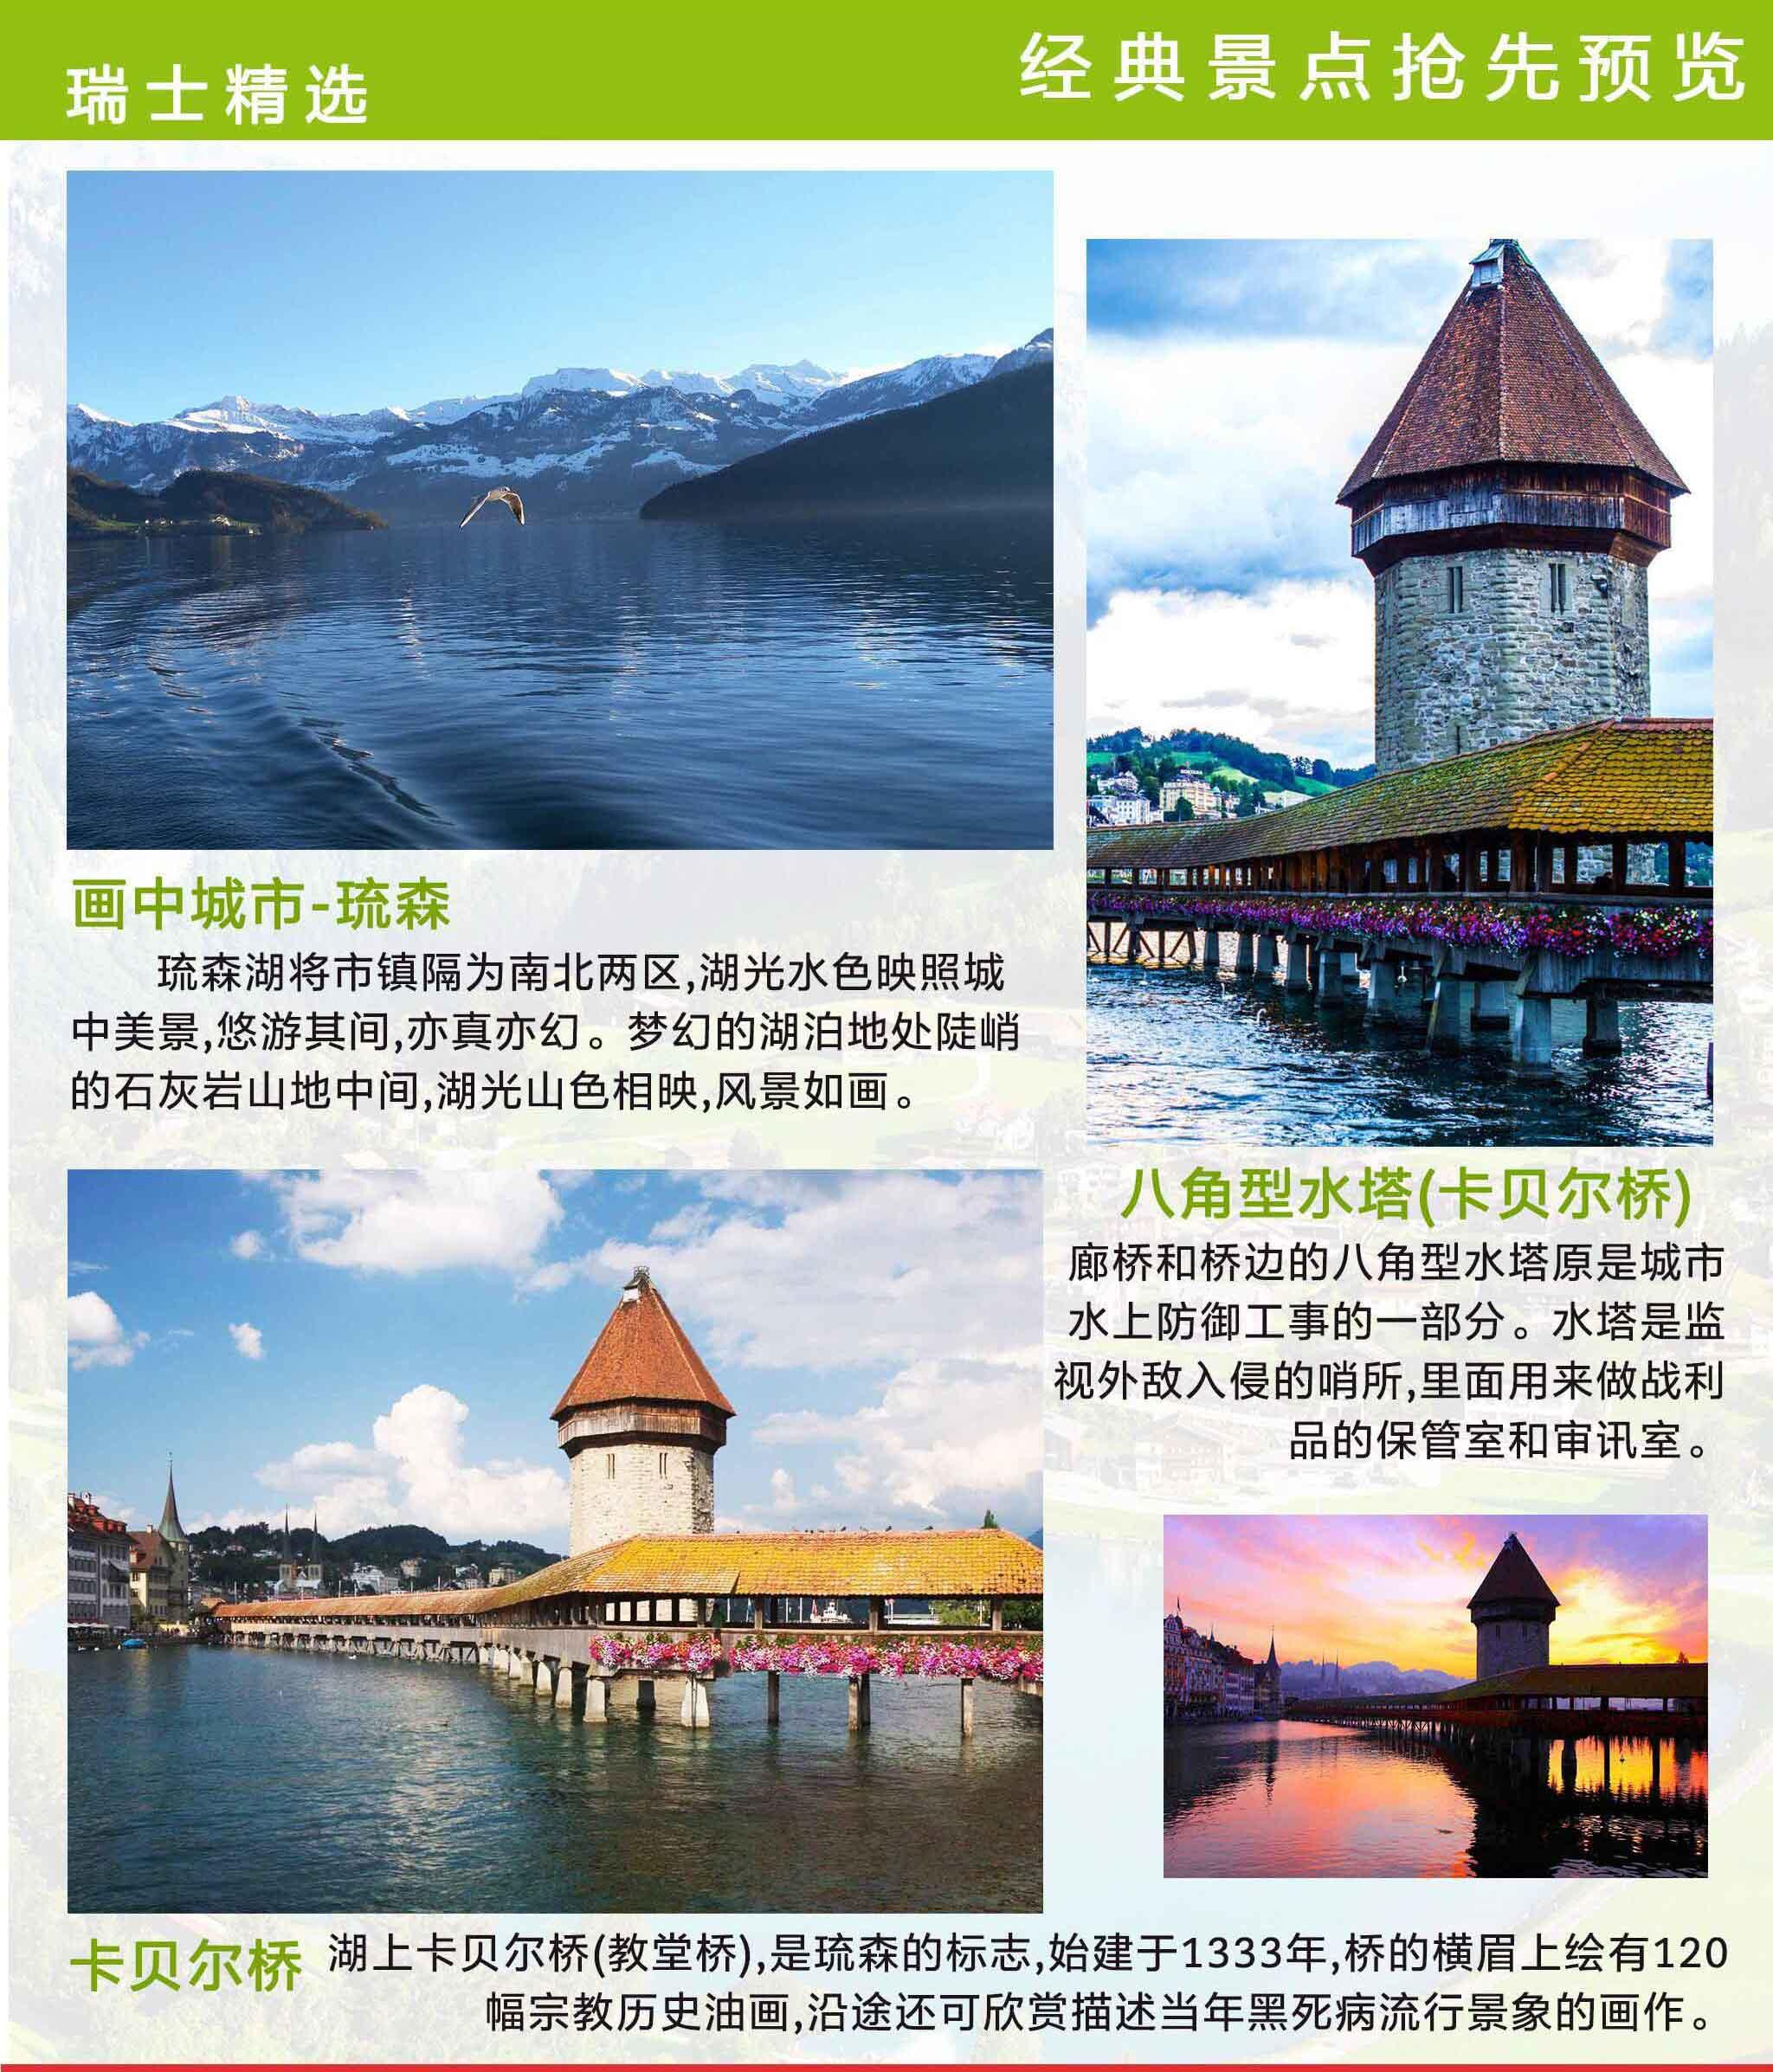 images/6/merch/109/oGyYYq6Z0Se7Kd6Gy56z535yfi8y6Z.jpg